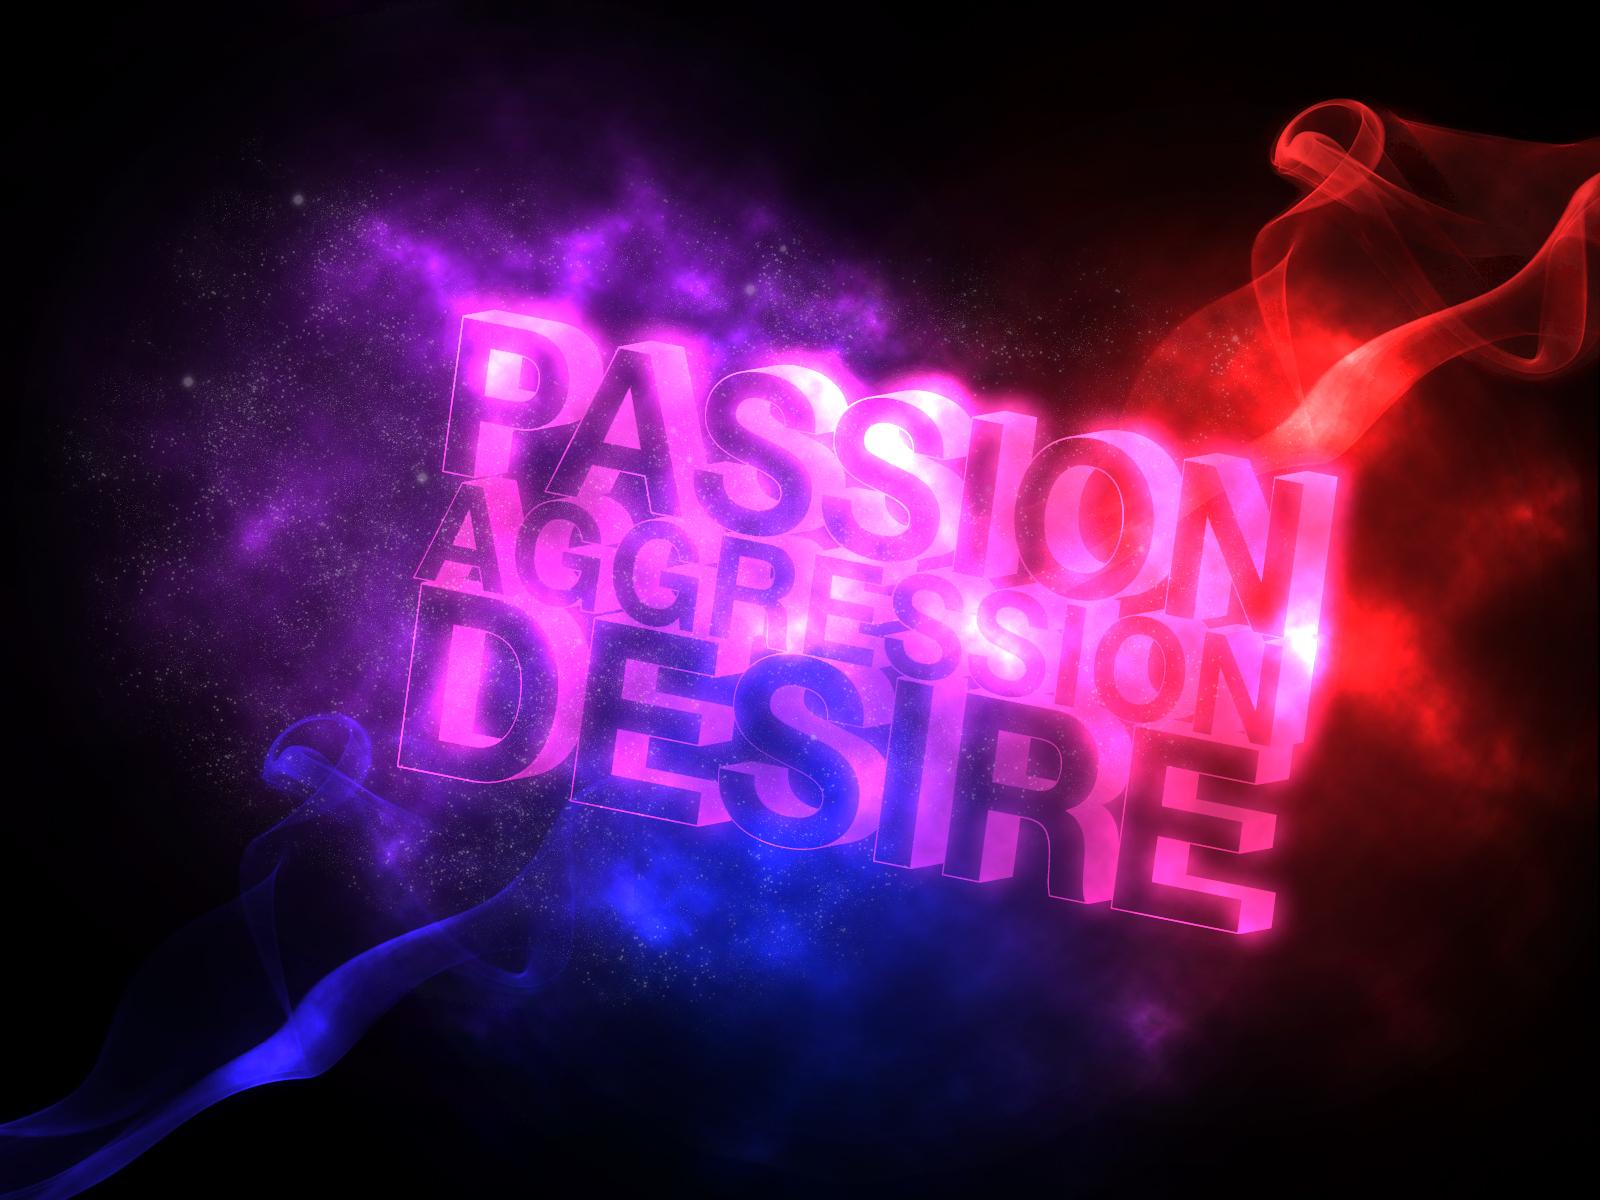 PassionDesire.jpg